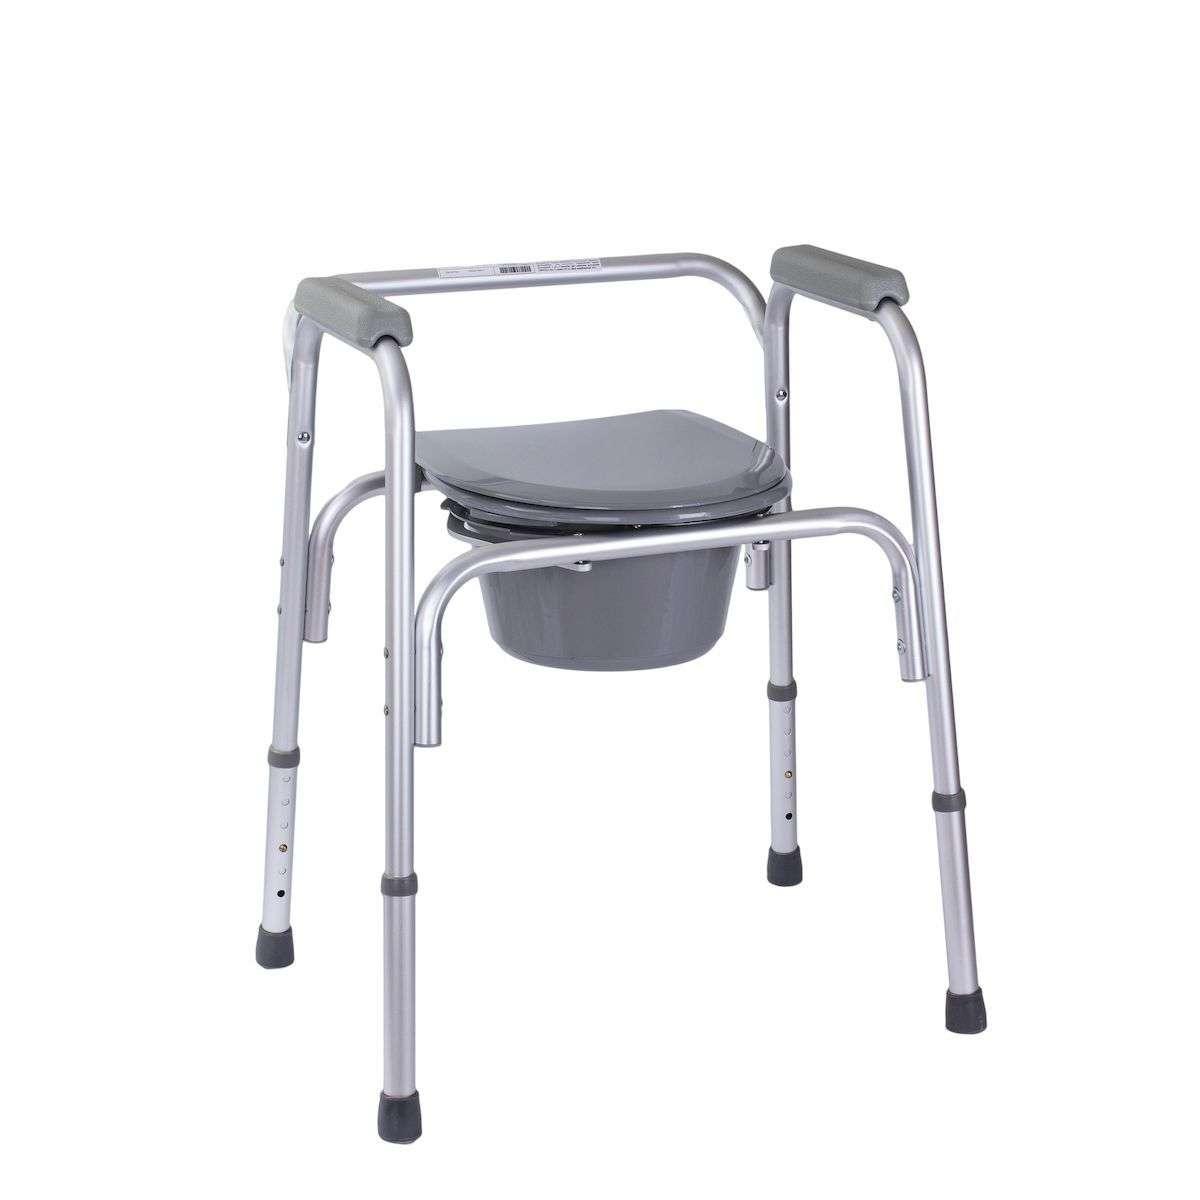 Алюминиевый стул-туалет 3в1, OSD-RB-2109А